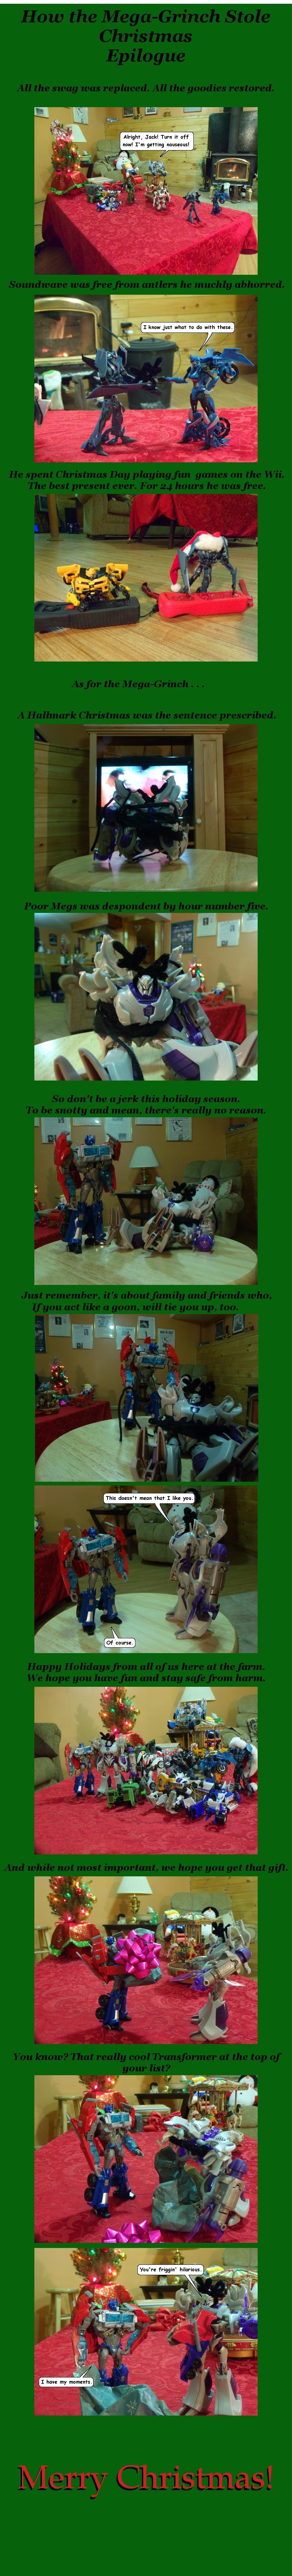 How the Grinch Stole Christmas- Epilogue by naturegirl52180